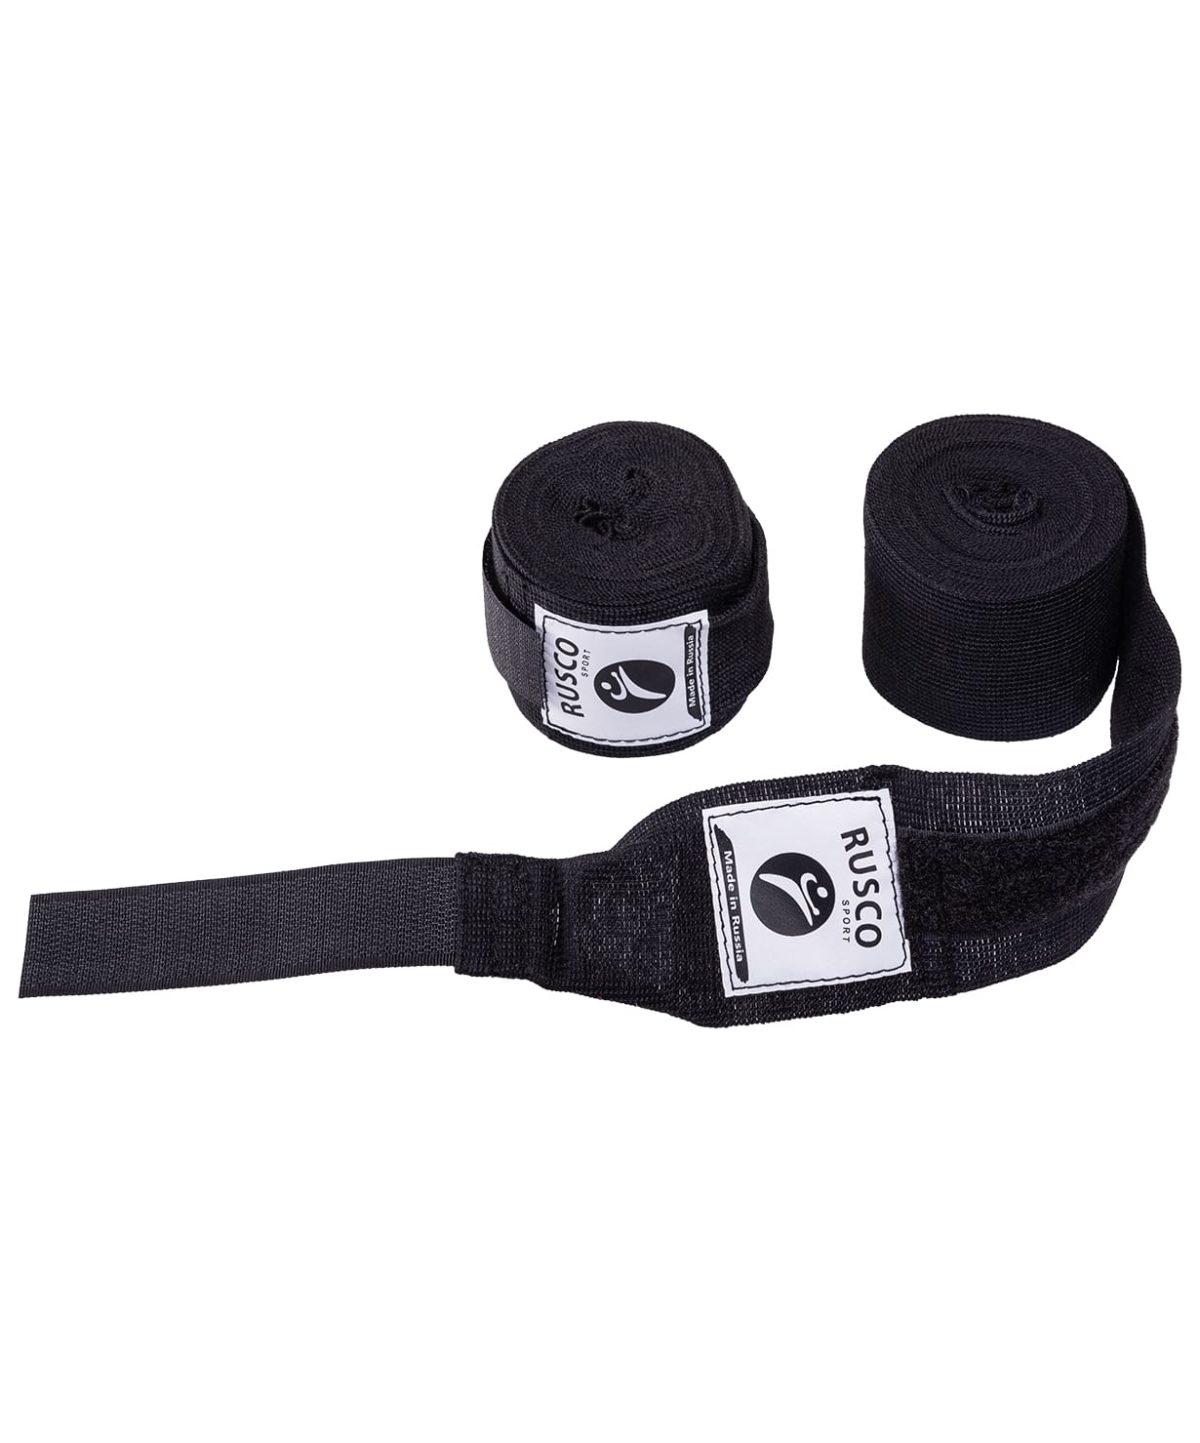 RUSCO Бинт боксерский, 2,5м, хлопок  126: чёрный - 1